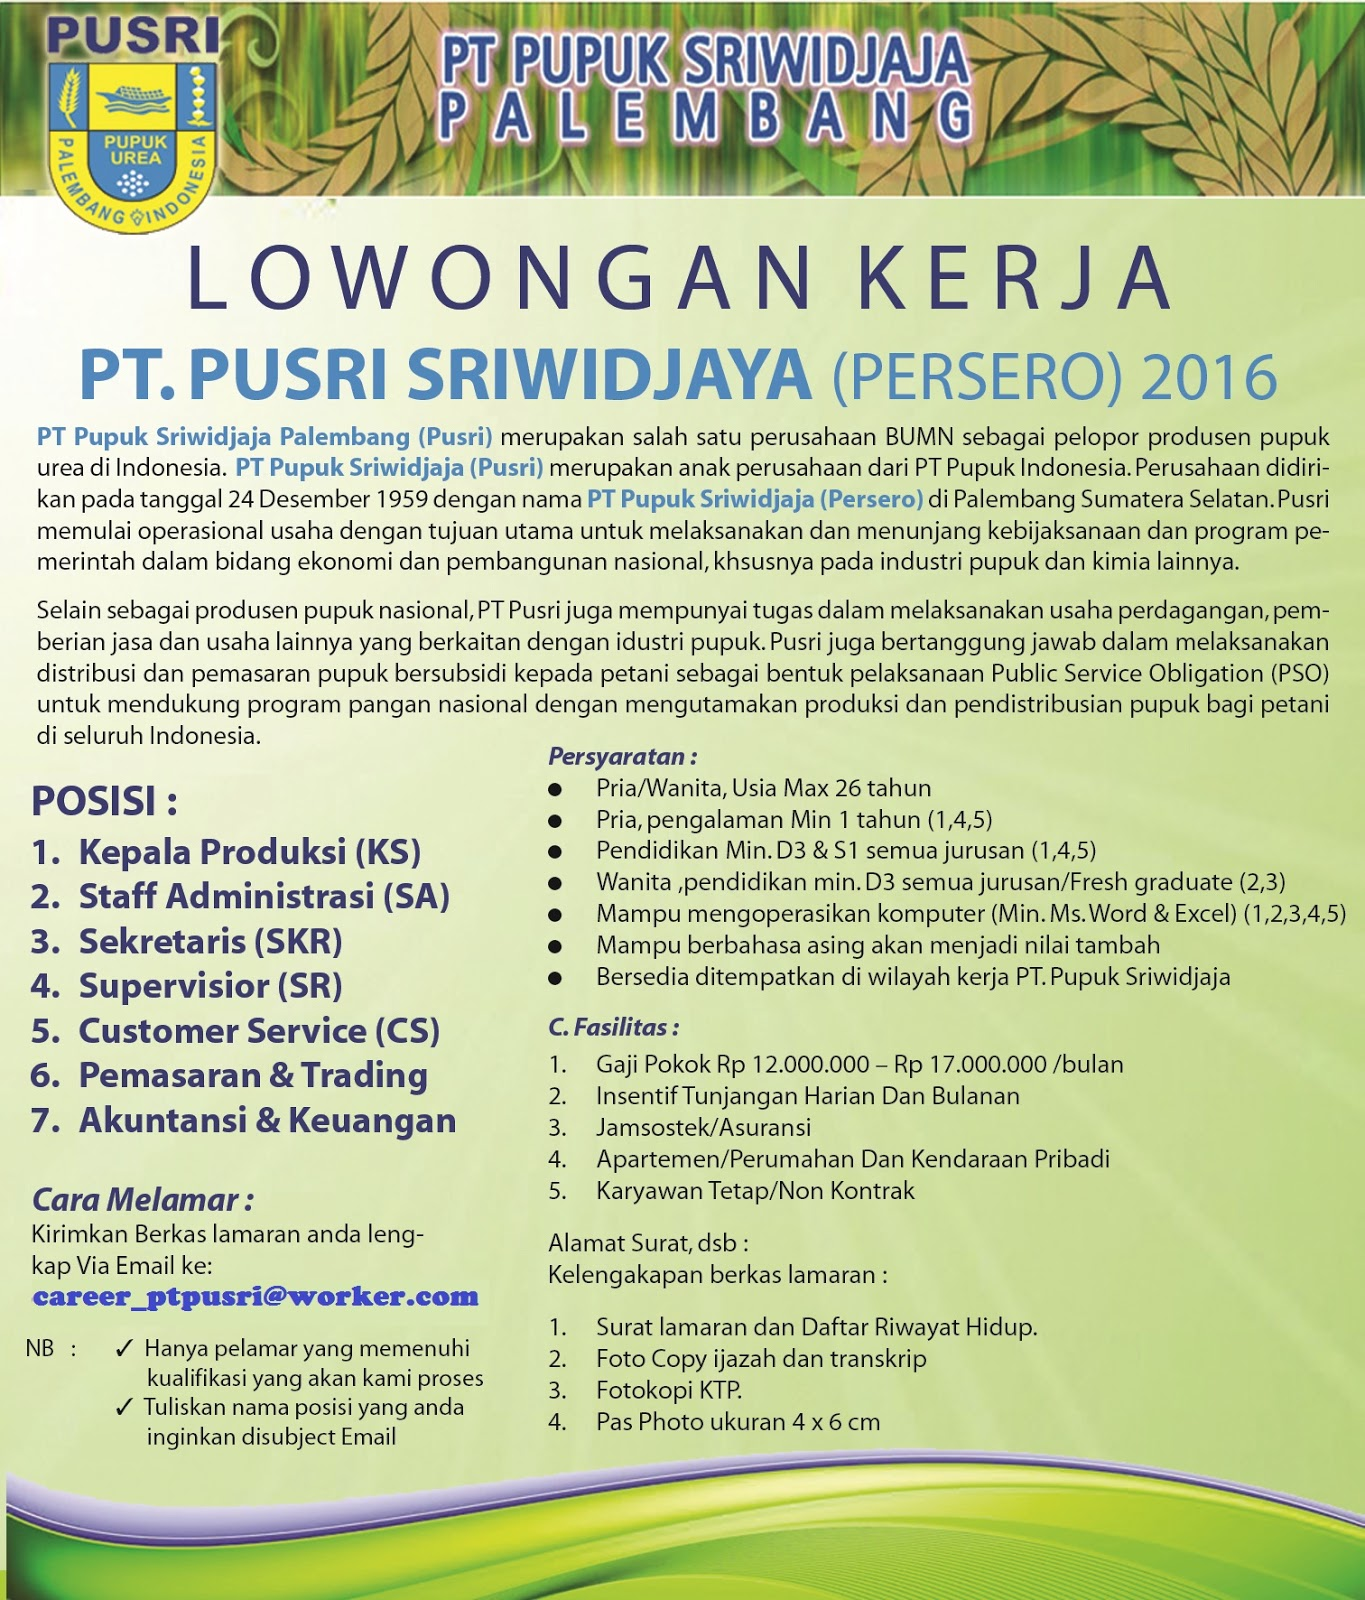 INFO Lowongan Kerja Bulan Agustus dan September 2016 PT.PUSRI PERSERO  Info Bursa Lowongan